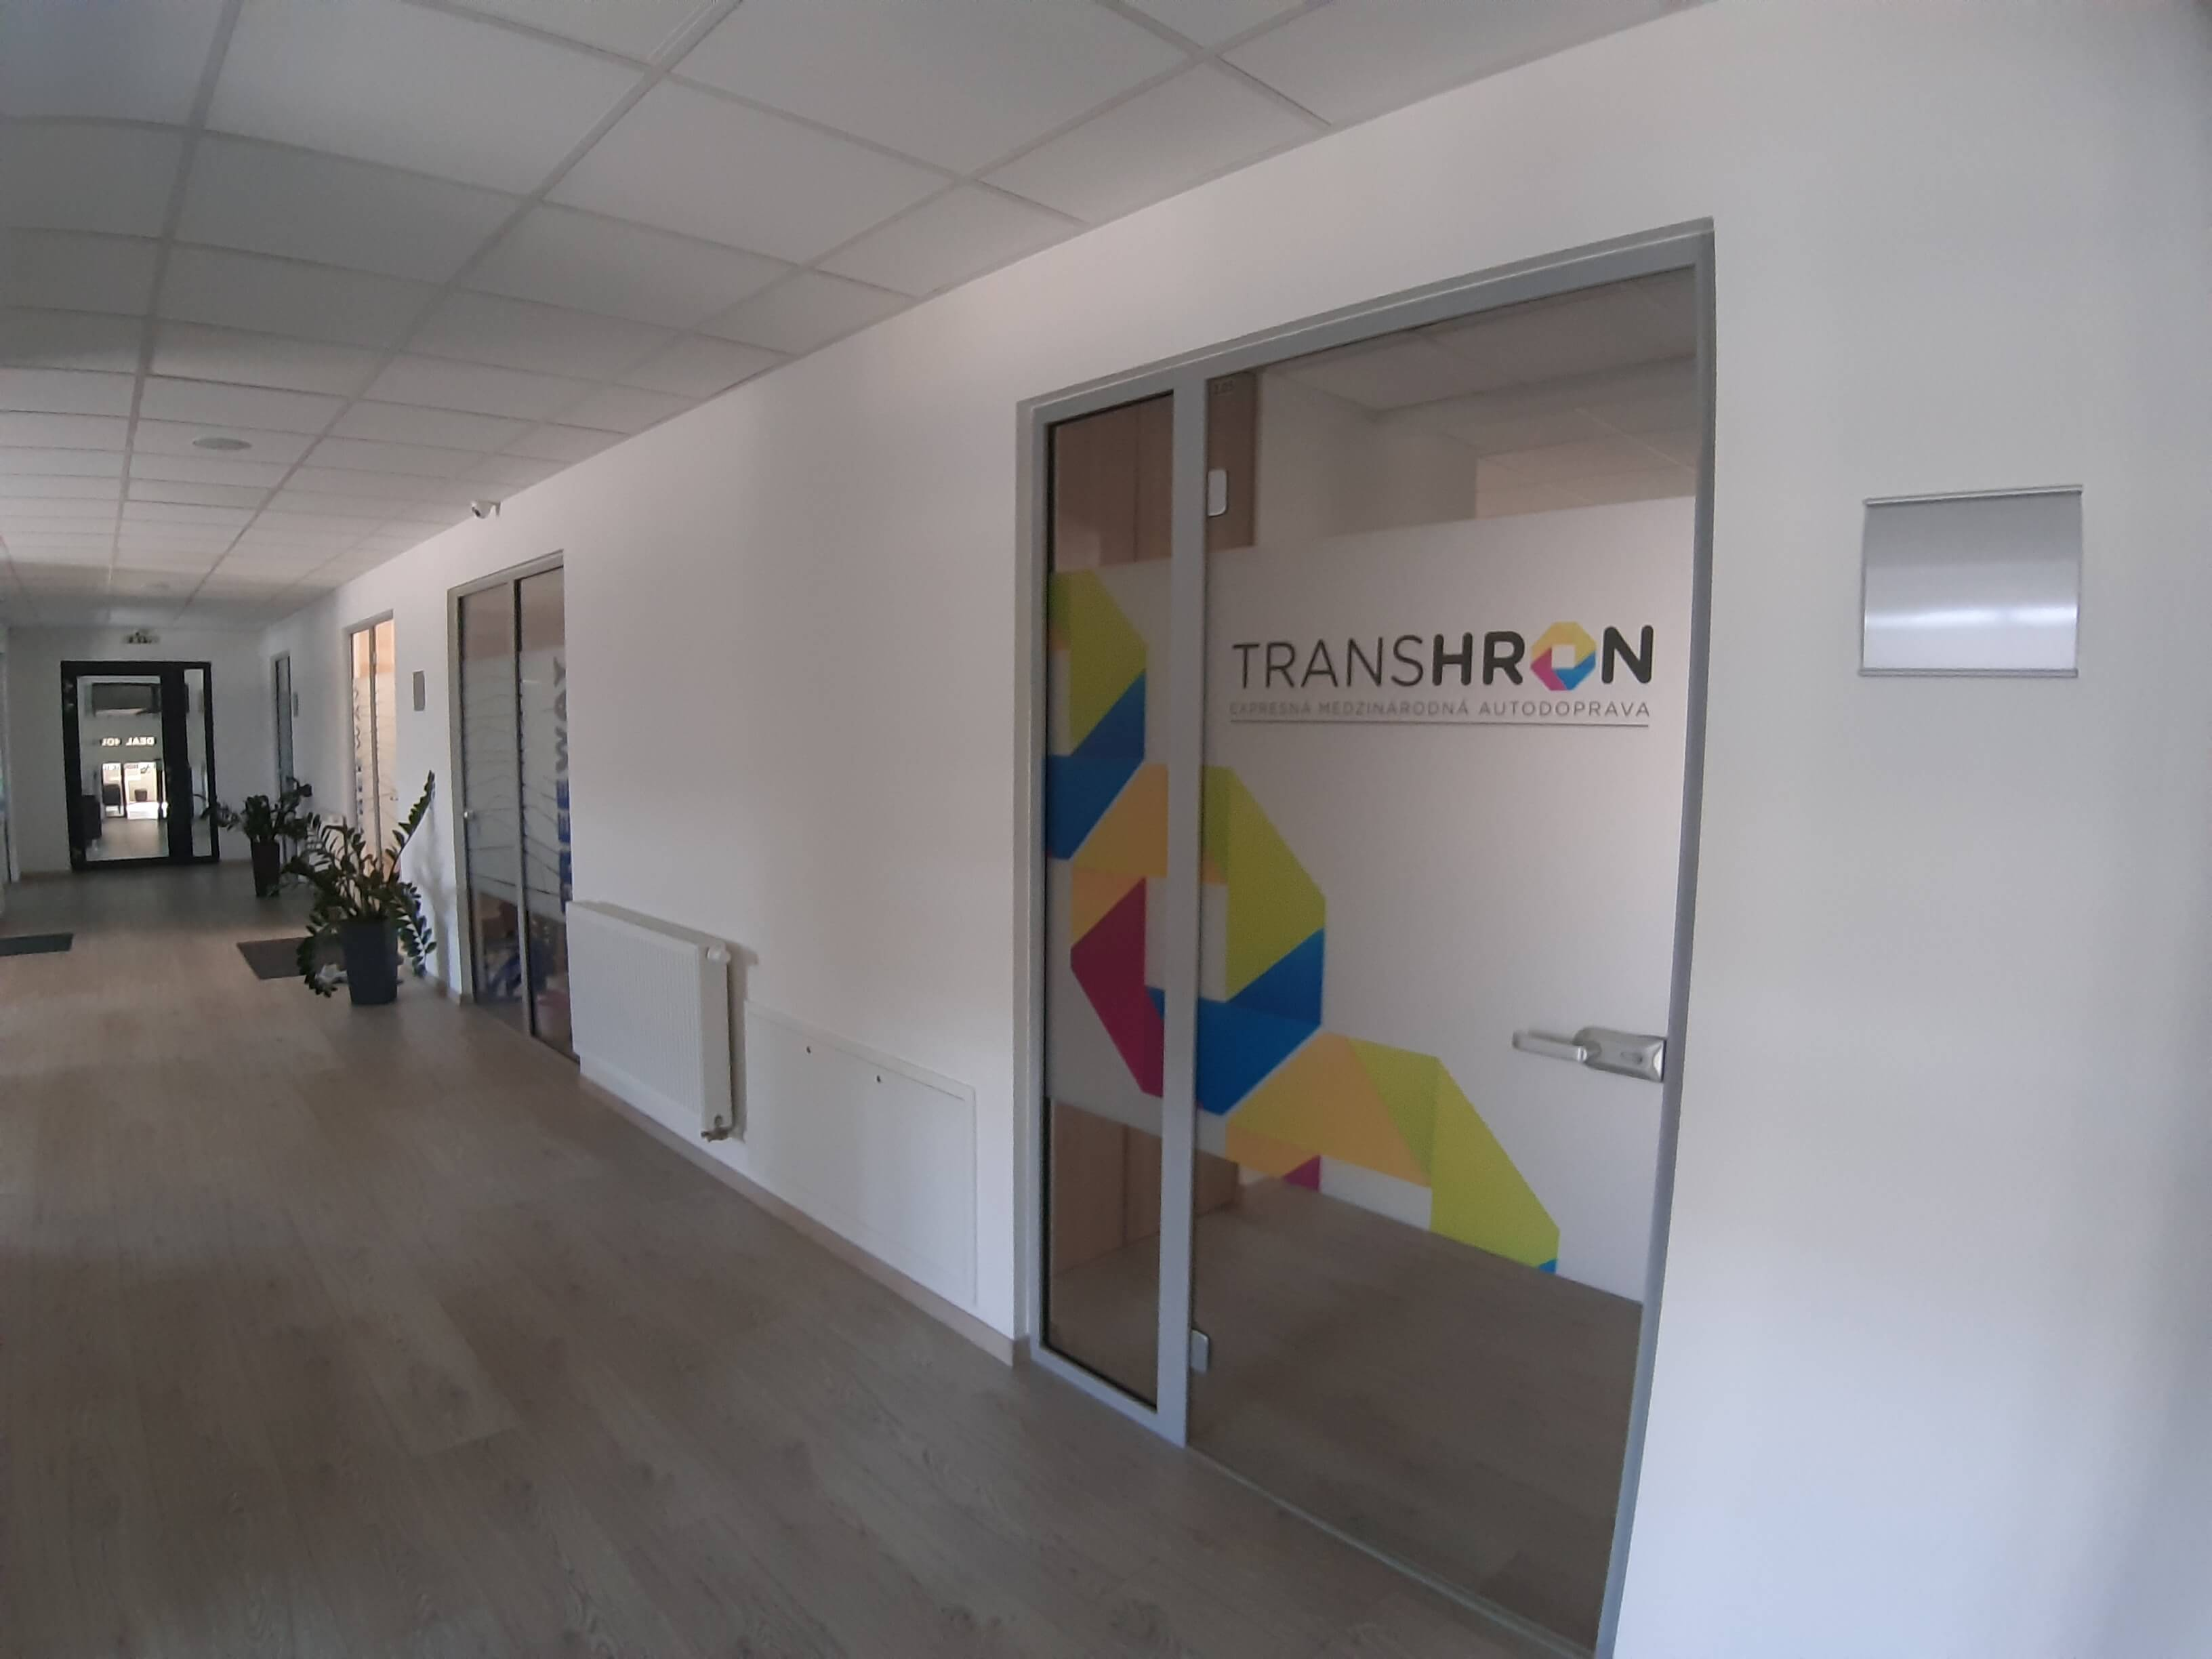 Transhorn Levice